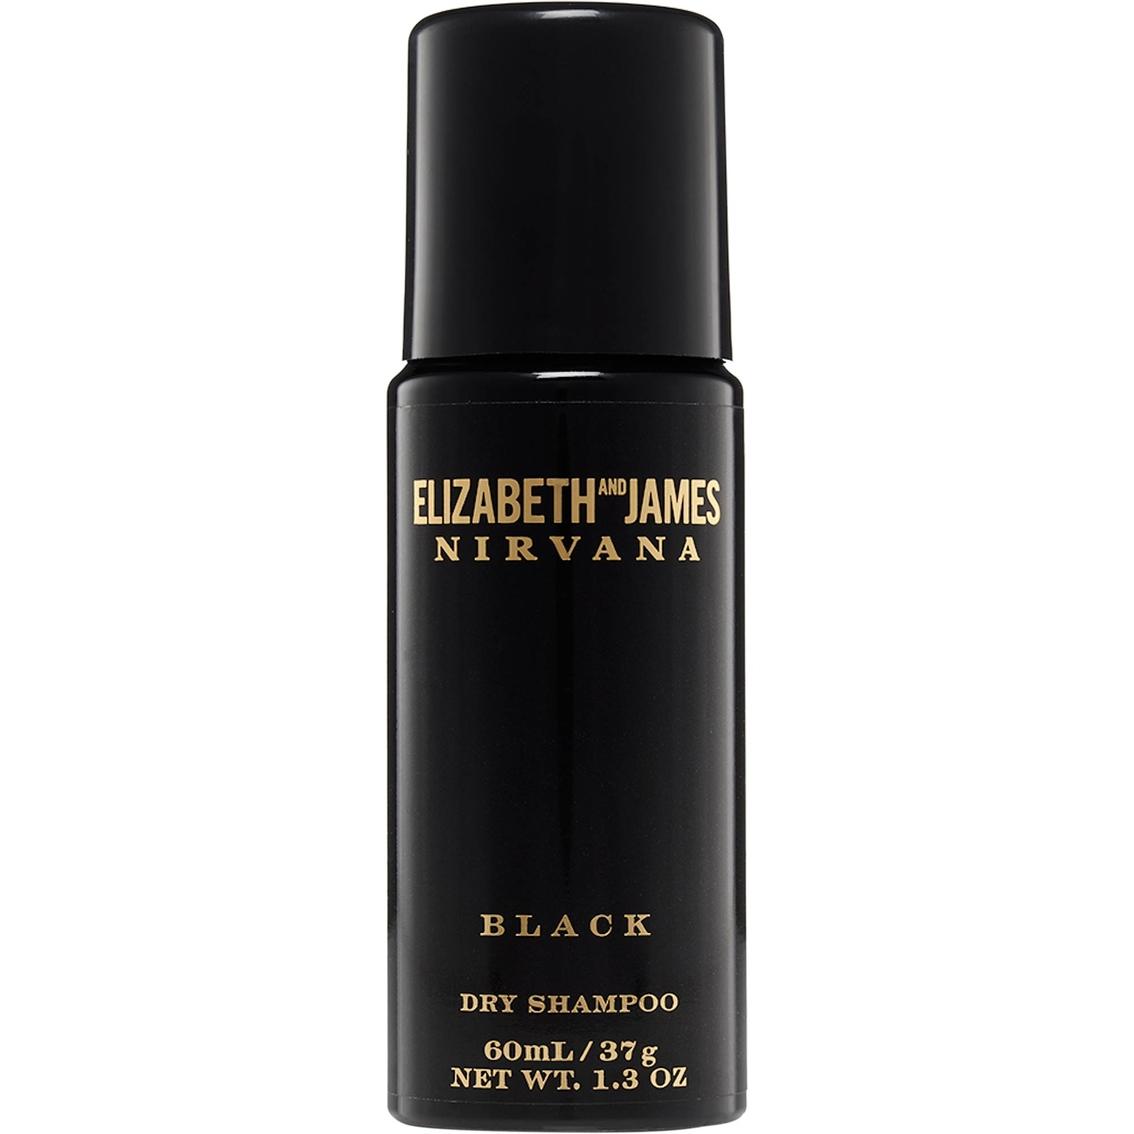 Elizabeth And James Nirvana Black Dry Shampoo | Shampoo